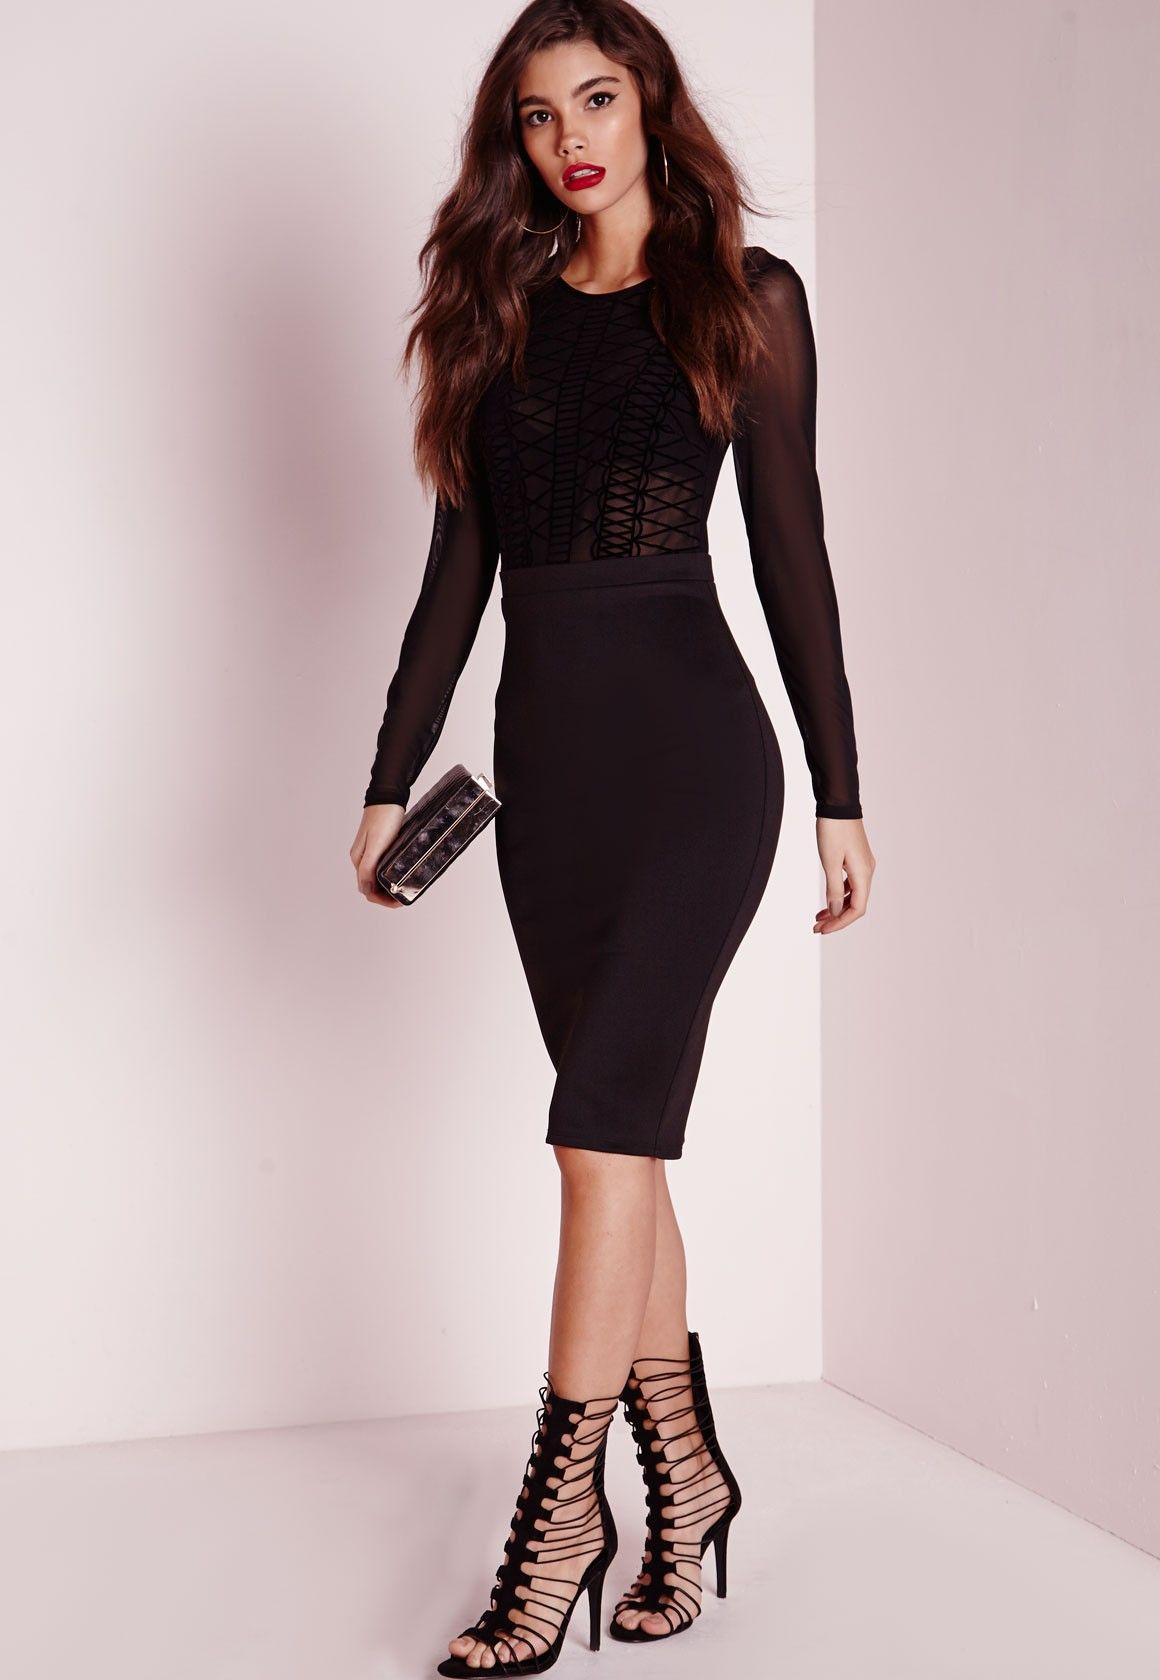 Missguided Long Sleeve Mesh Top Midi Dress Black Simple Long Sleeve Dress Black Midi Dress Midi Dress [ 1680 x 1160 Pixel ]